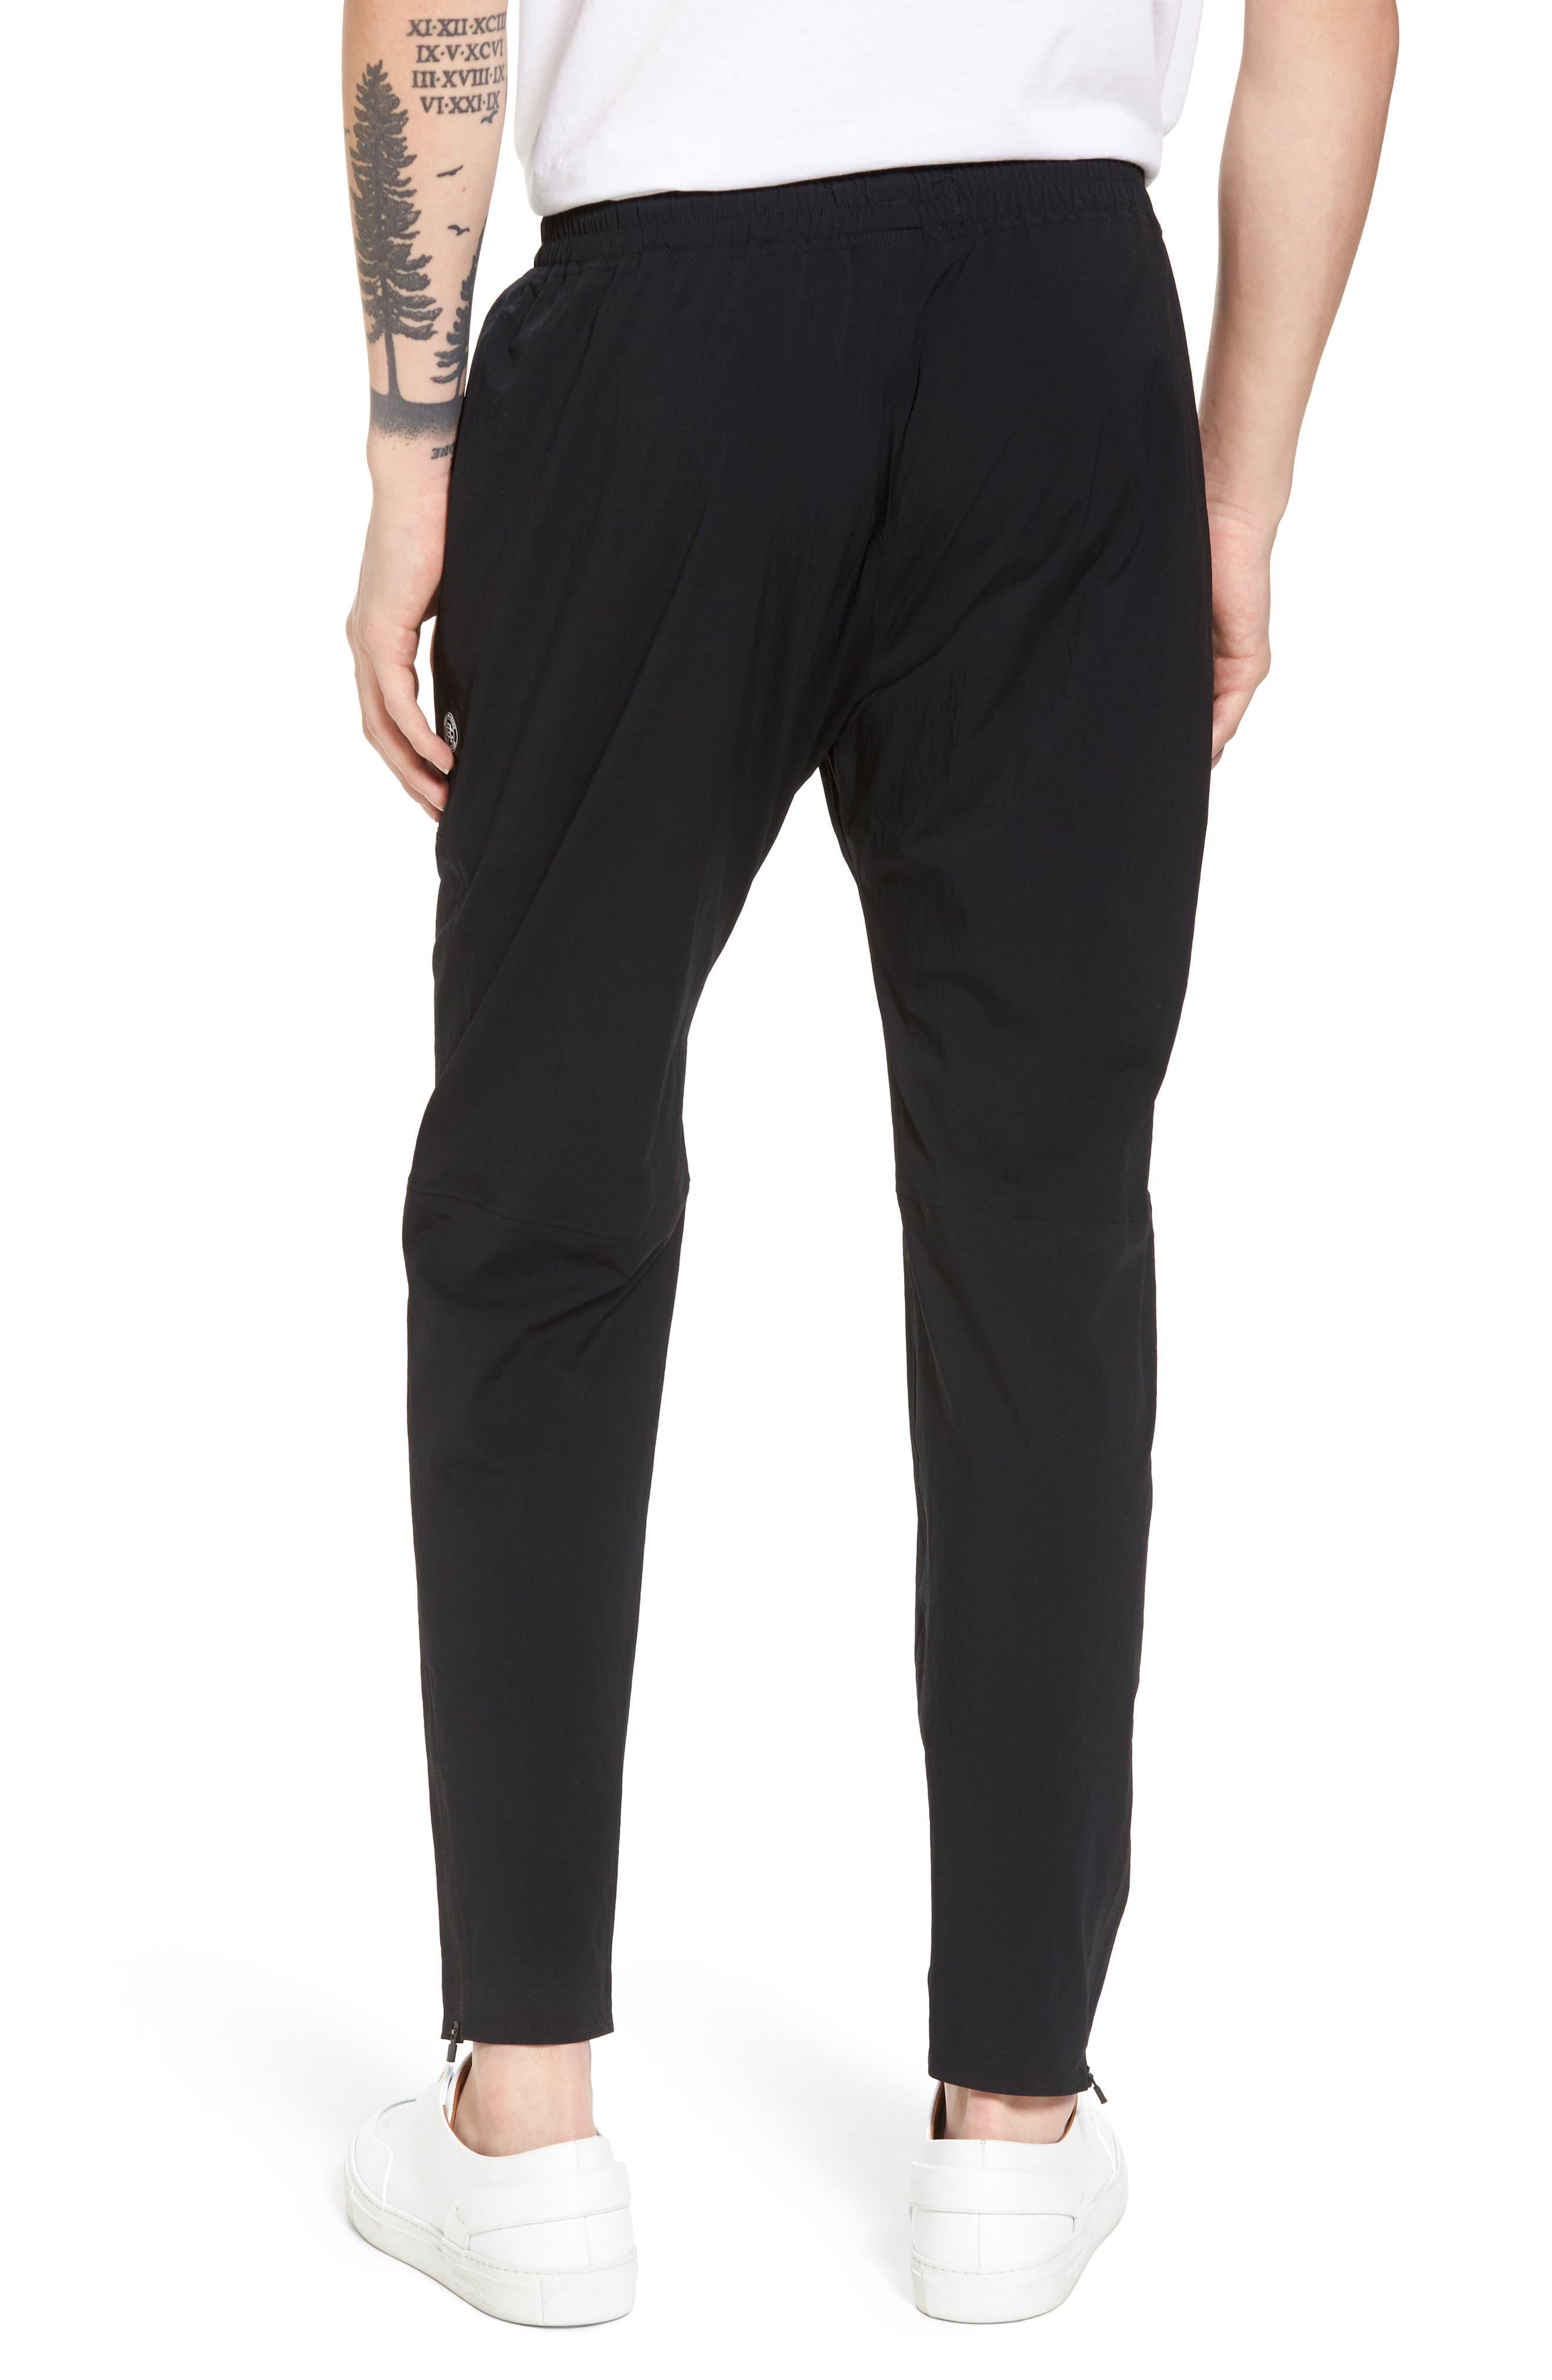 N279 Sweatpants,                             Alternate thumbnail 2, color,                             Black